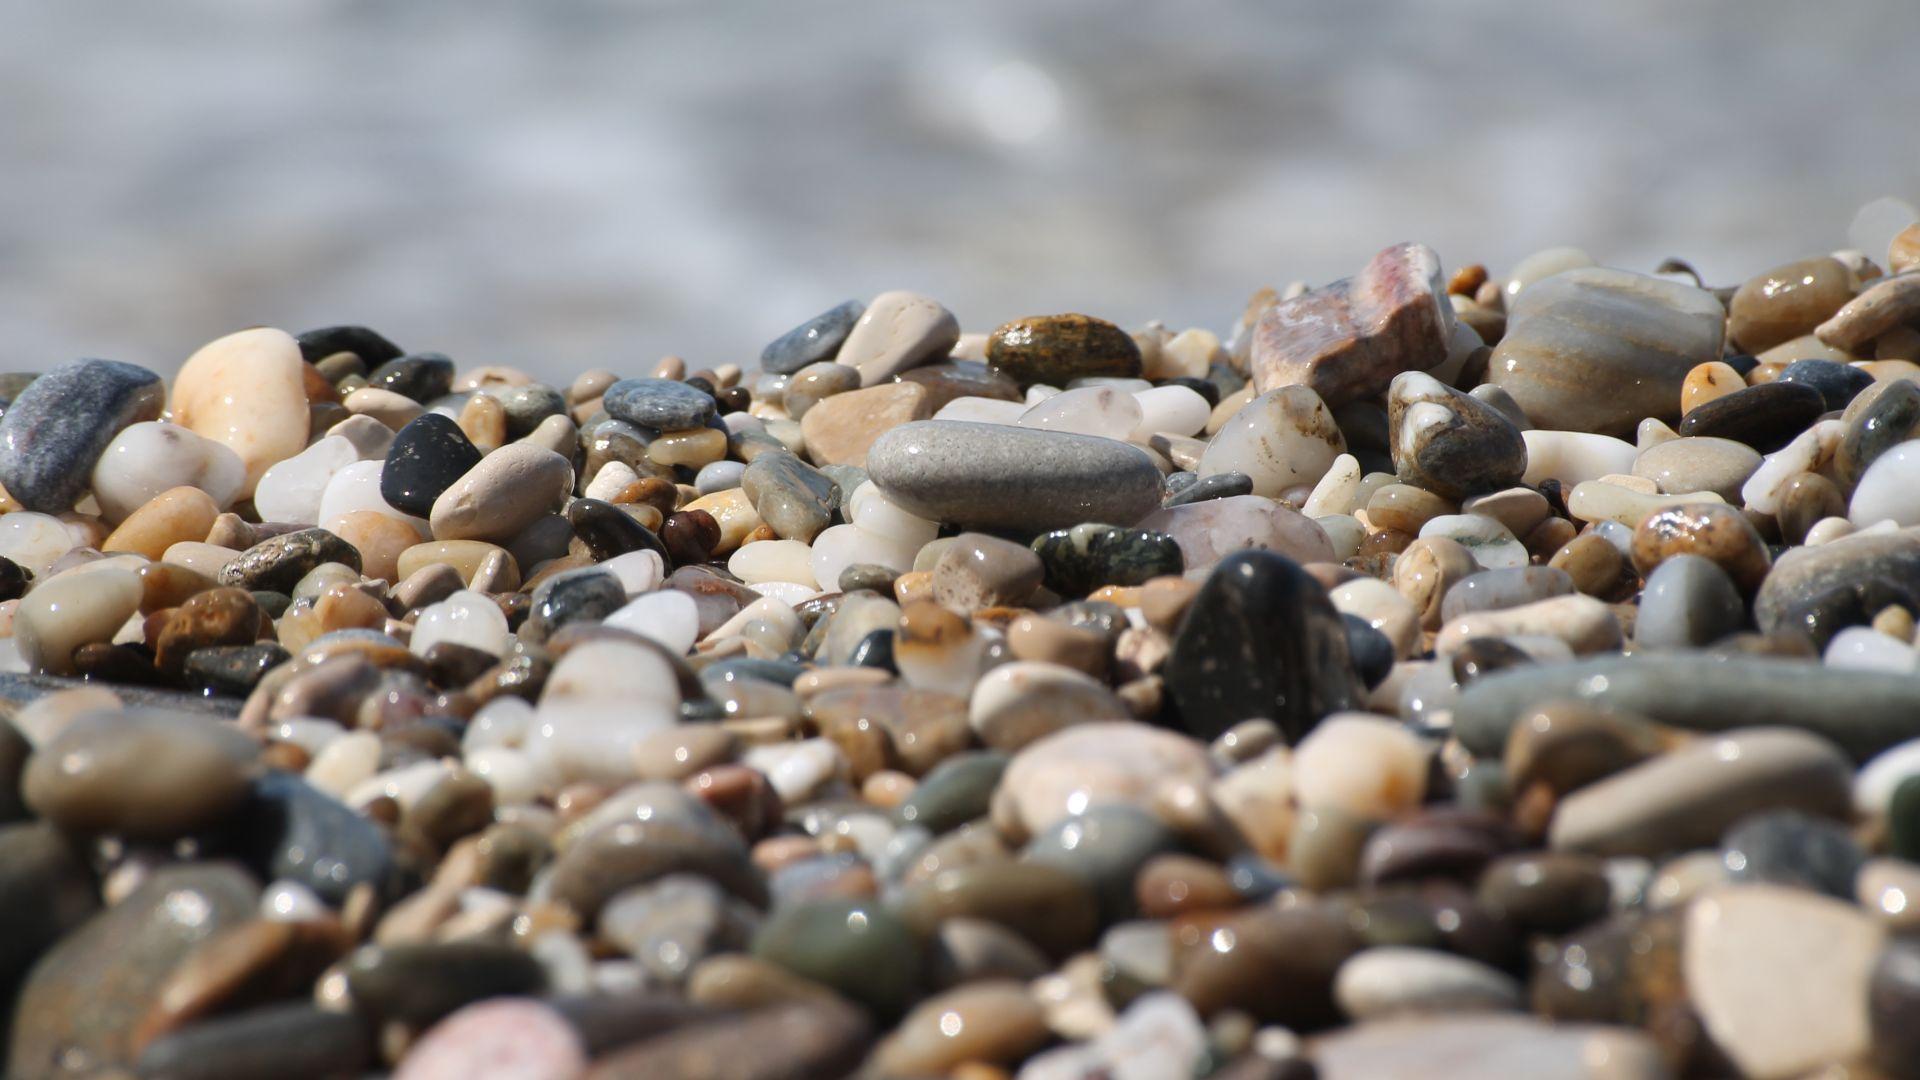 Wallpaper Shining pebbles, rocks